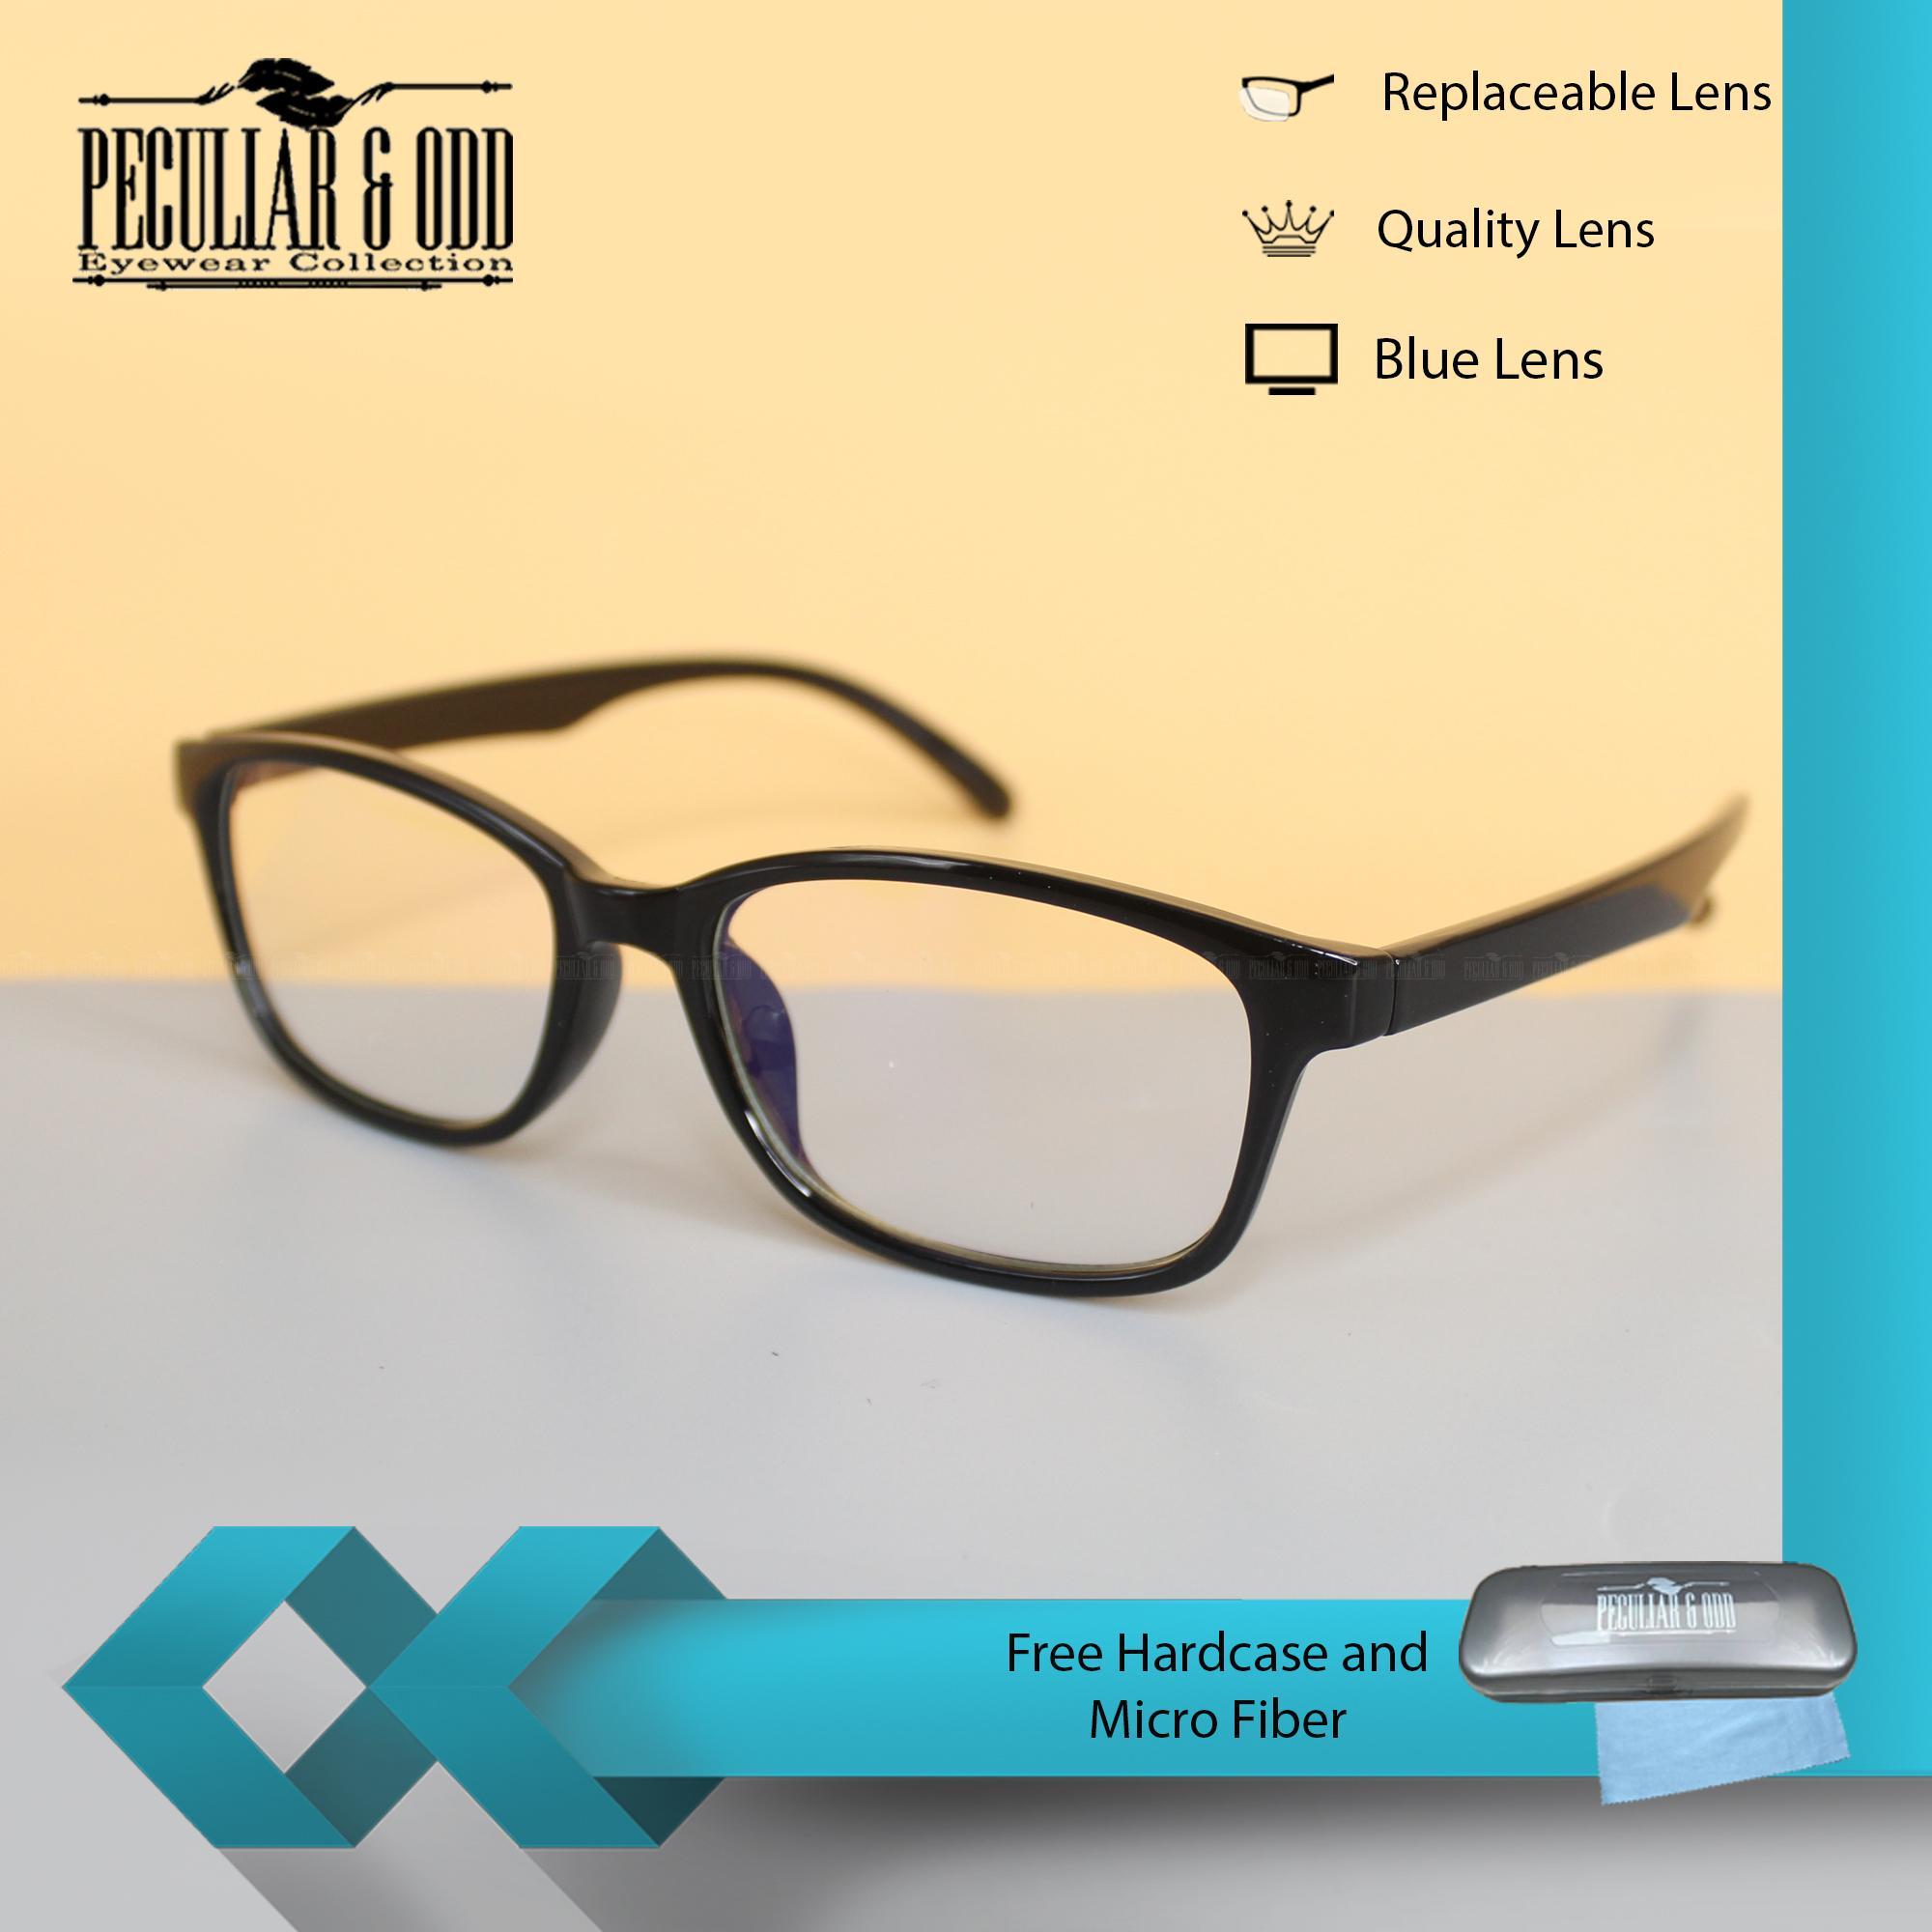 Eyeglasses For Men For Sale Mens Eyeglasses Online Brands Prices